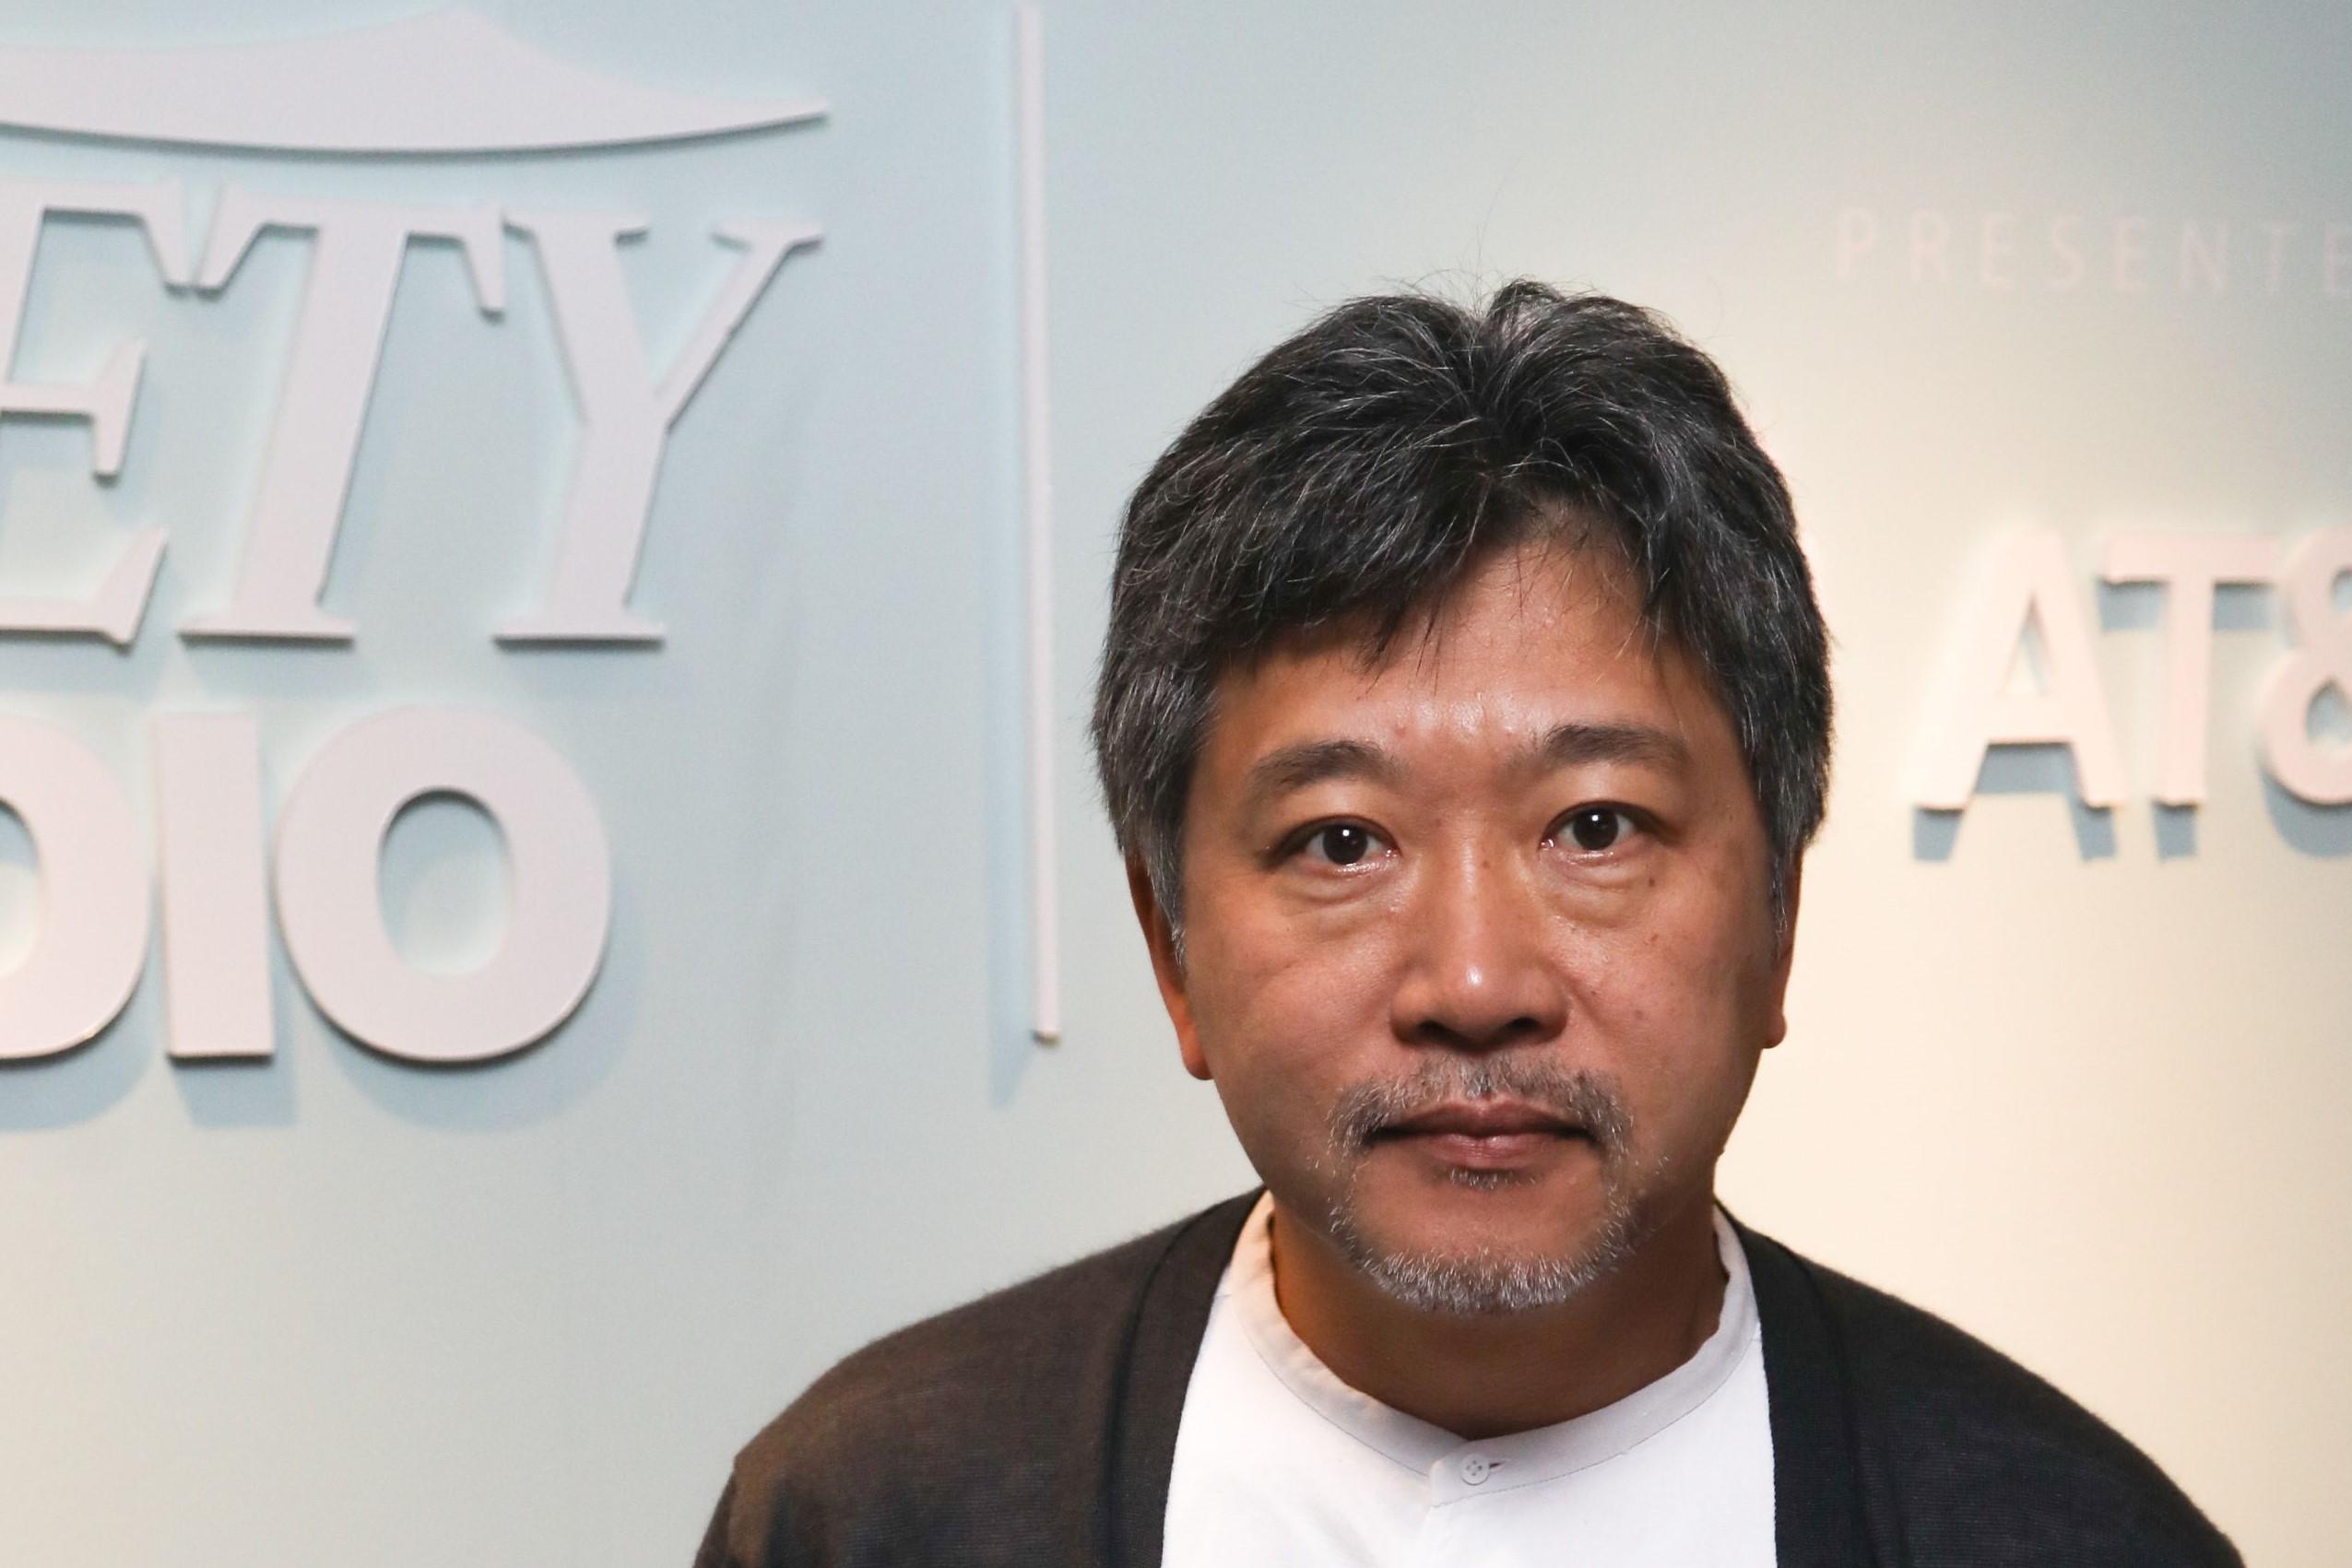 Hirokazu Kore-edaVariety Studio at Toronto International Film Festival, Presented by AT&T, Day 4, Canada - 09 Sep 2019